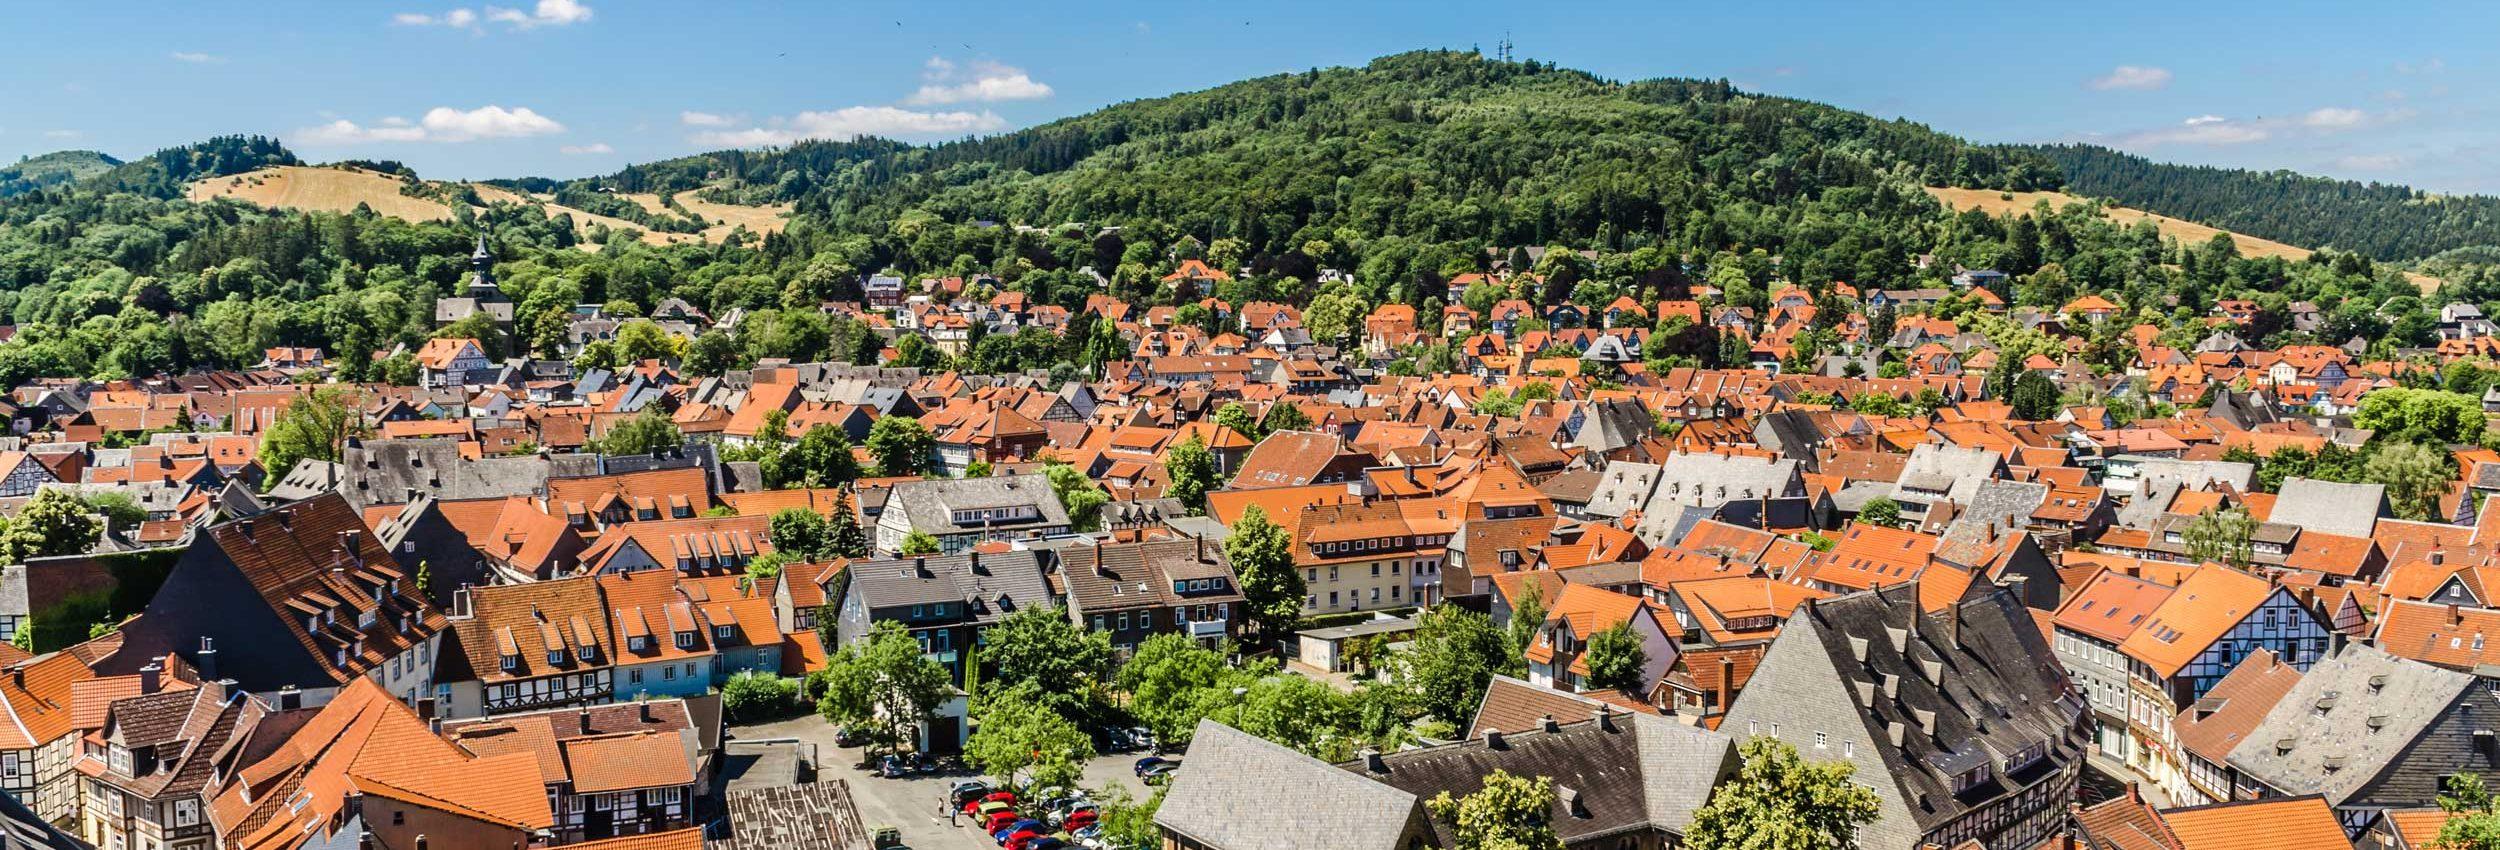 Germerott Immobilien - Immobilienmakler Goslar